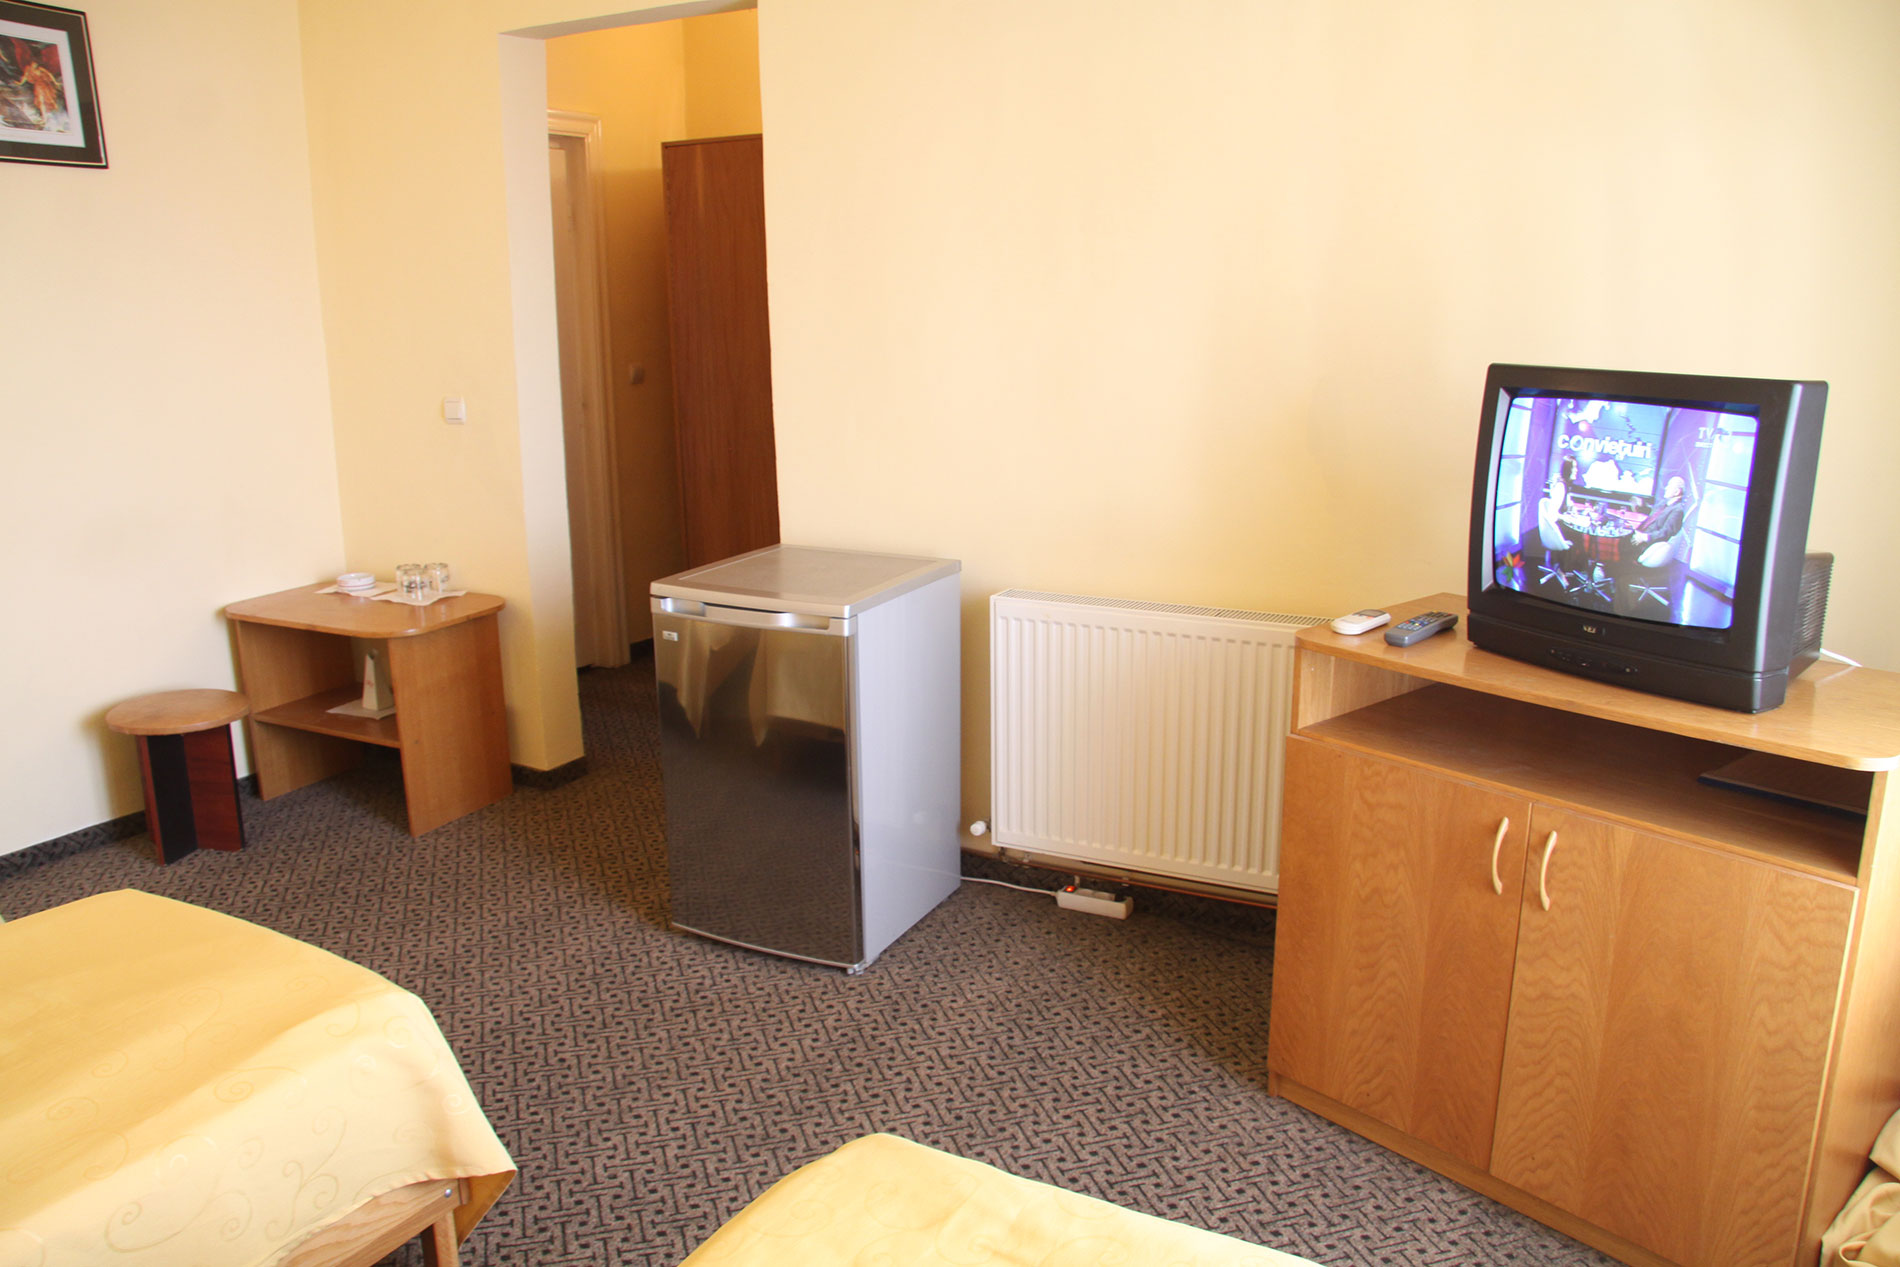 camera-hotel-corola-oradea-cazare-oradea-3